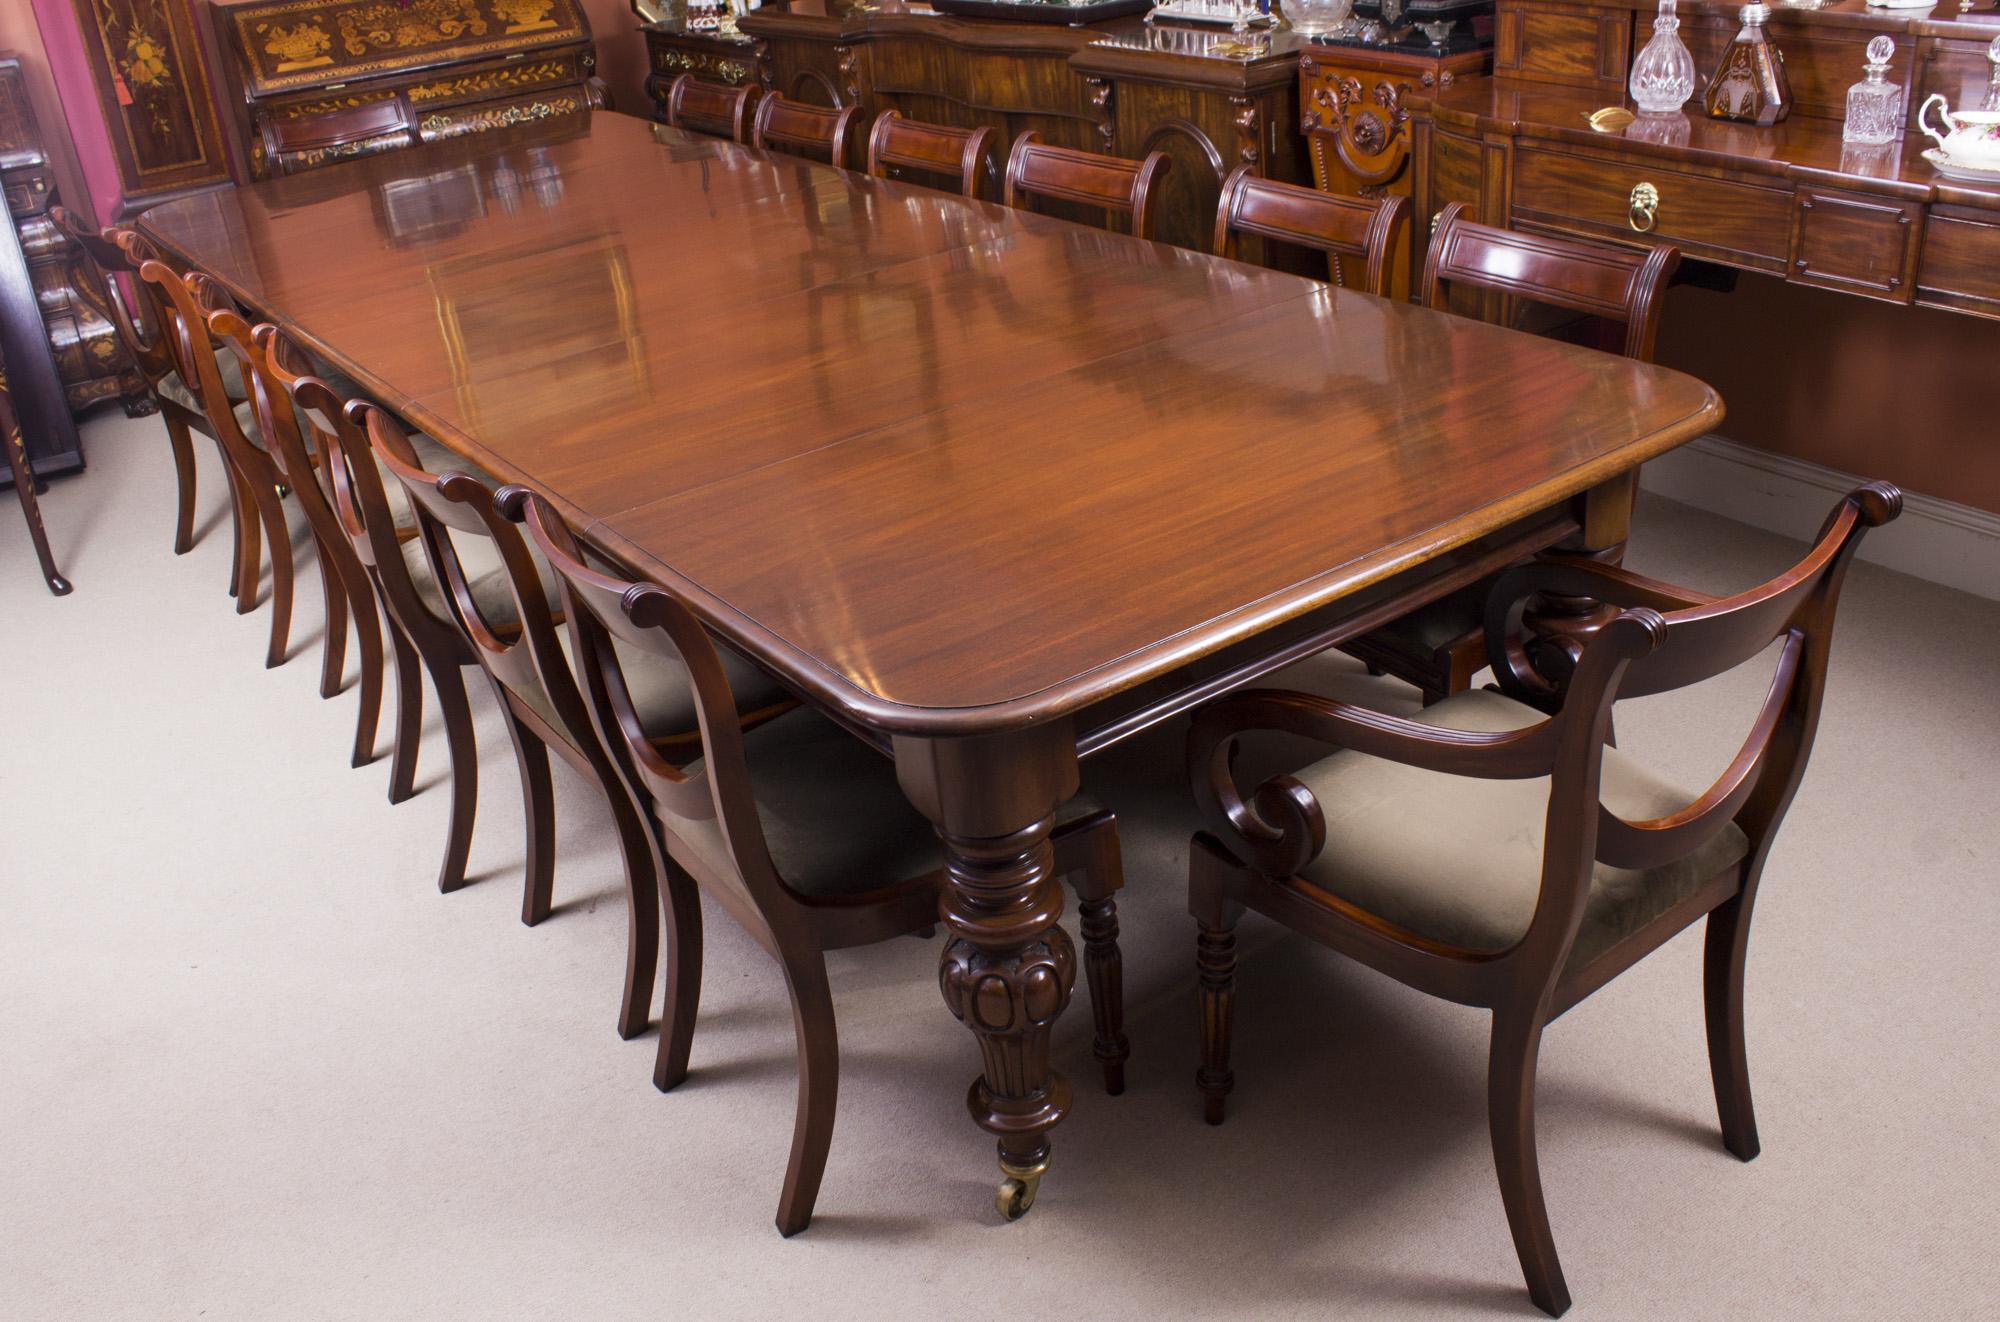 Antique Dining Table Ref No 08328a Regent Antiques